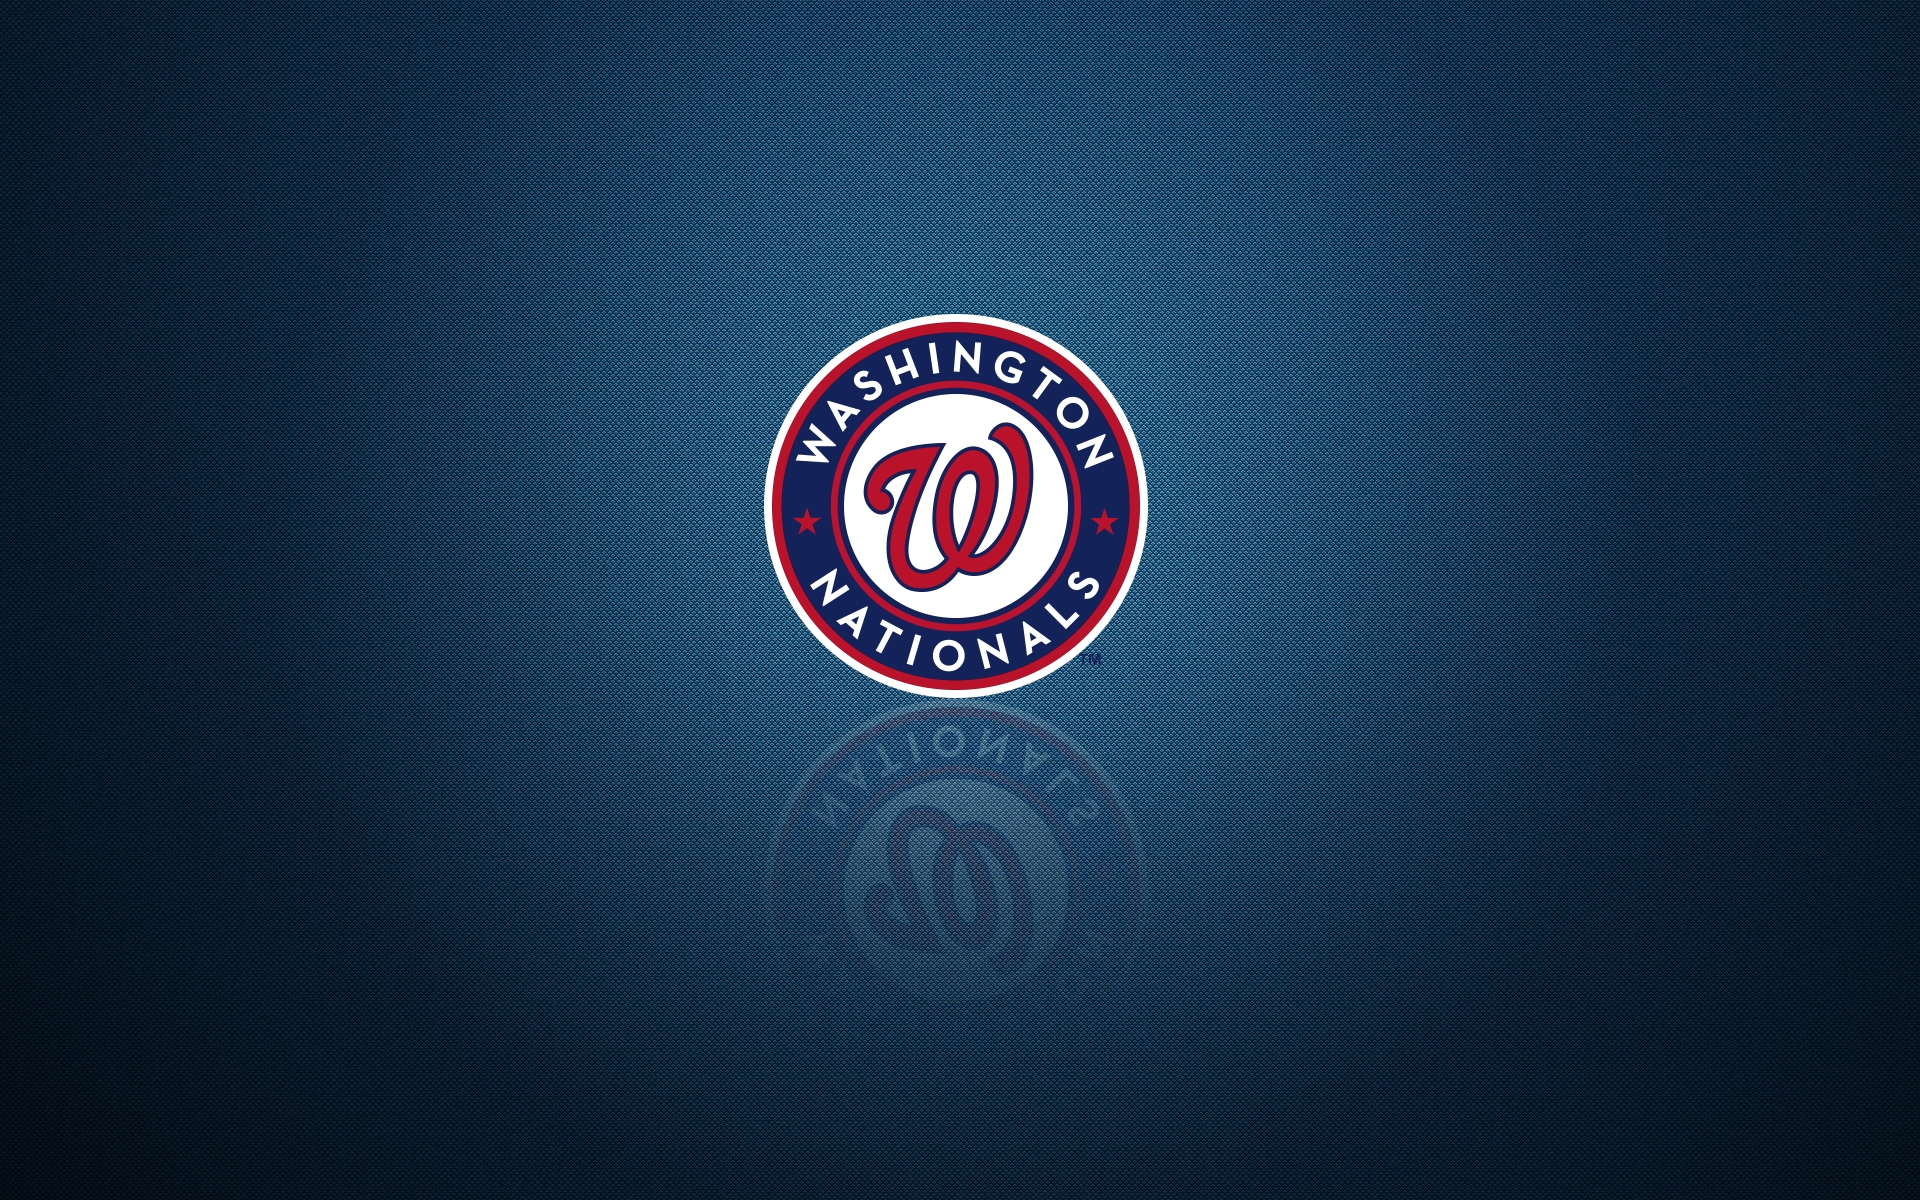 Washington Nationals Walgreens Logo